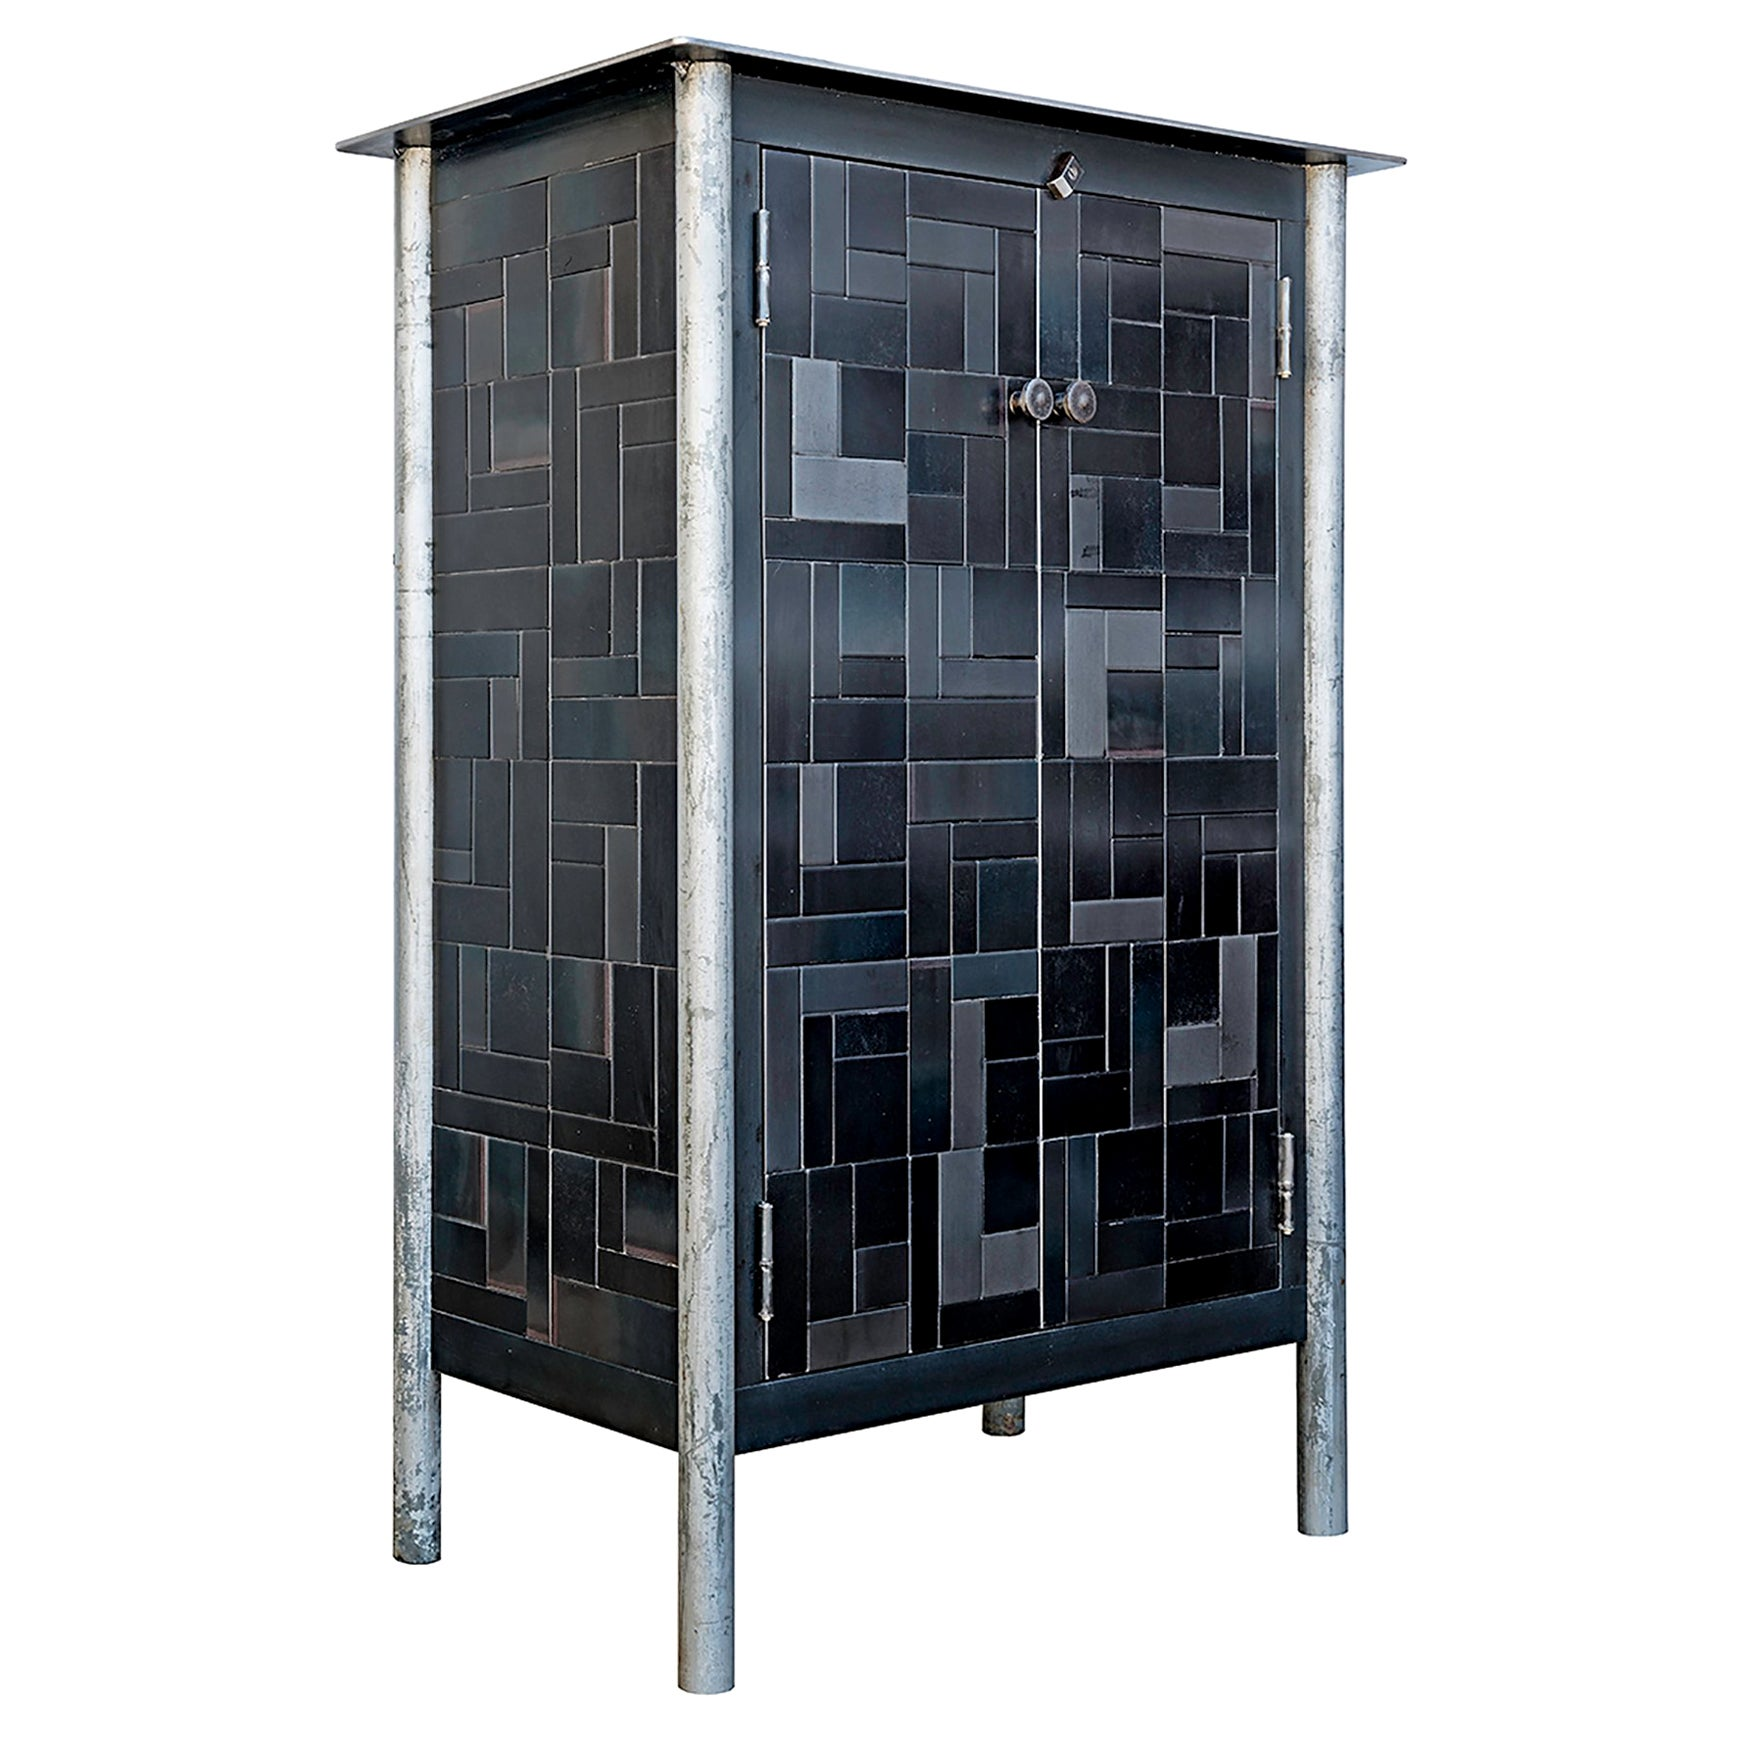 Jim Rose Half Housetop Gee's Inspired Quilt Cupboard, Steel Art Furniture